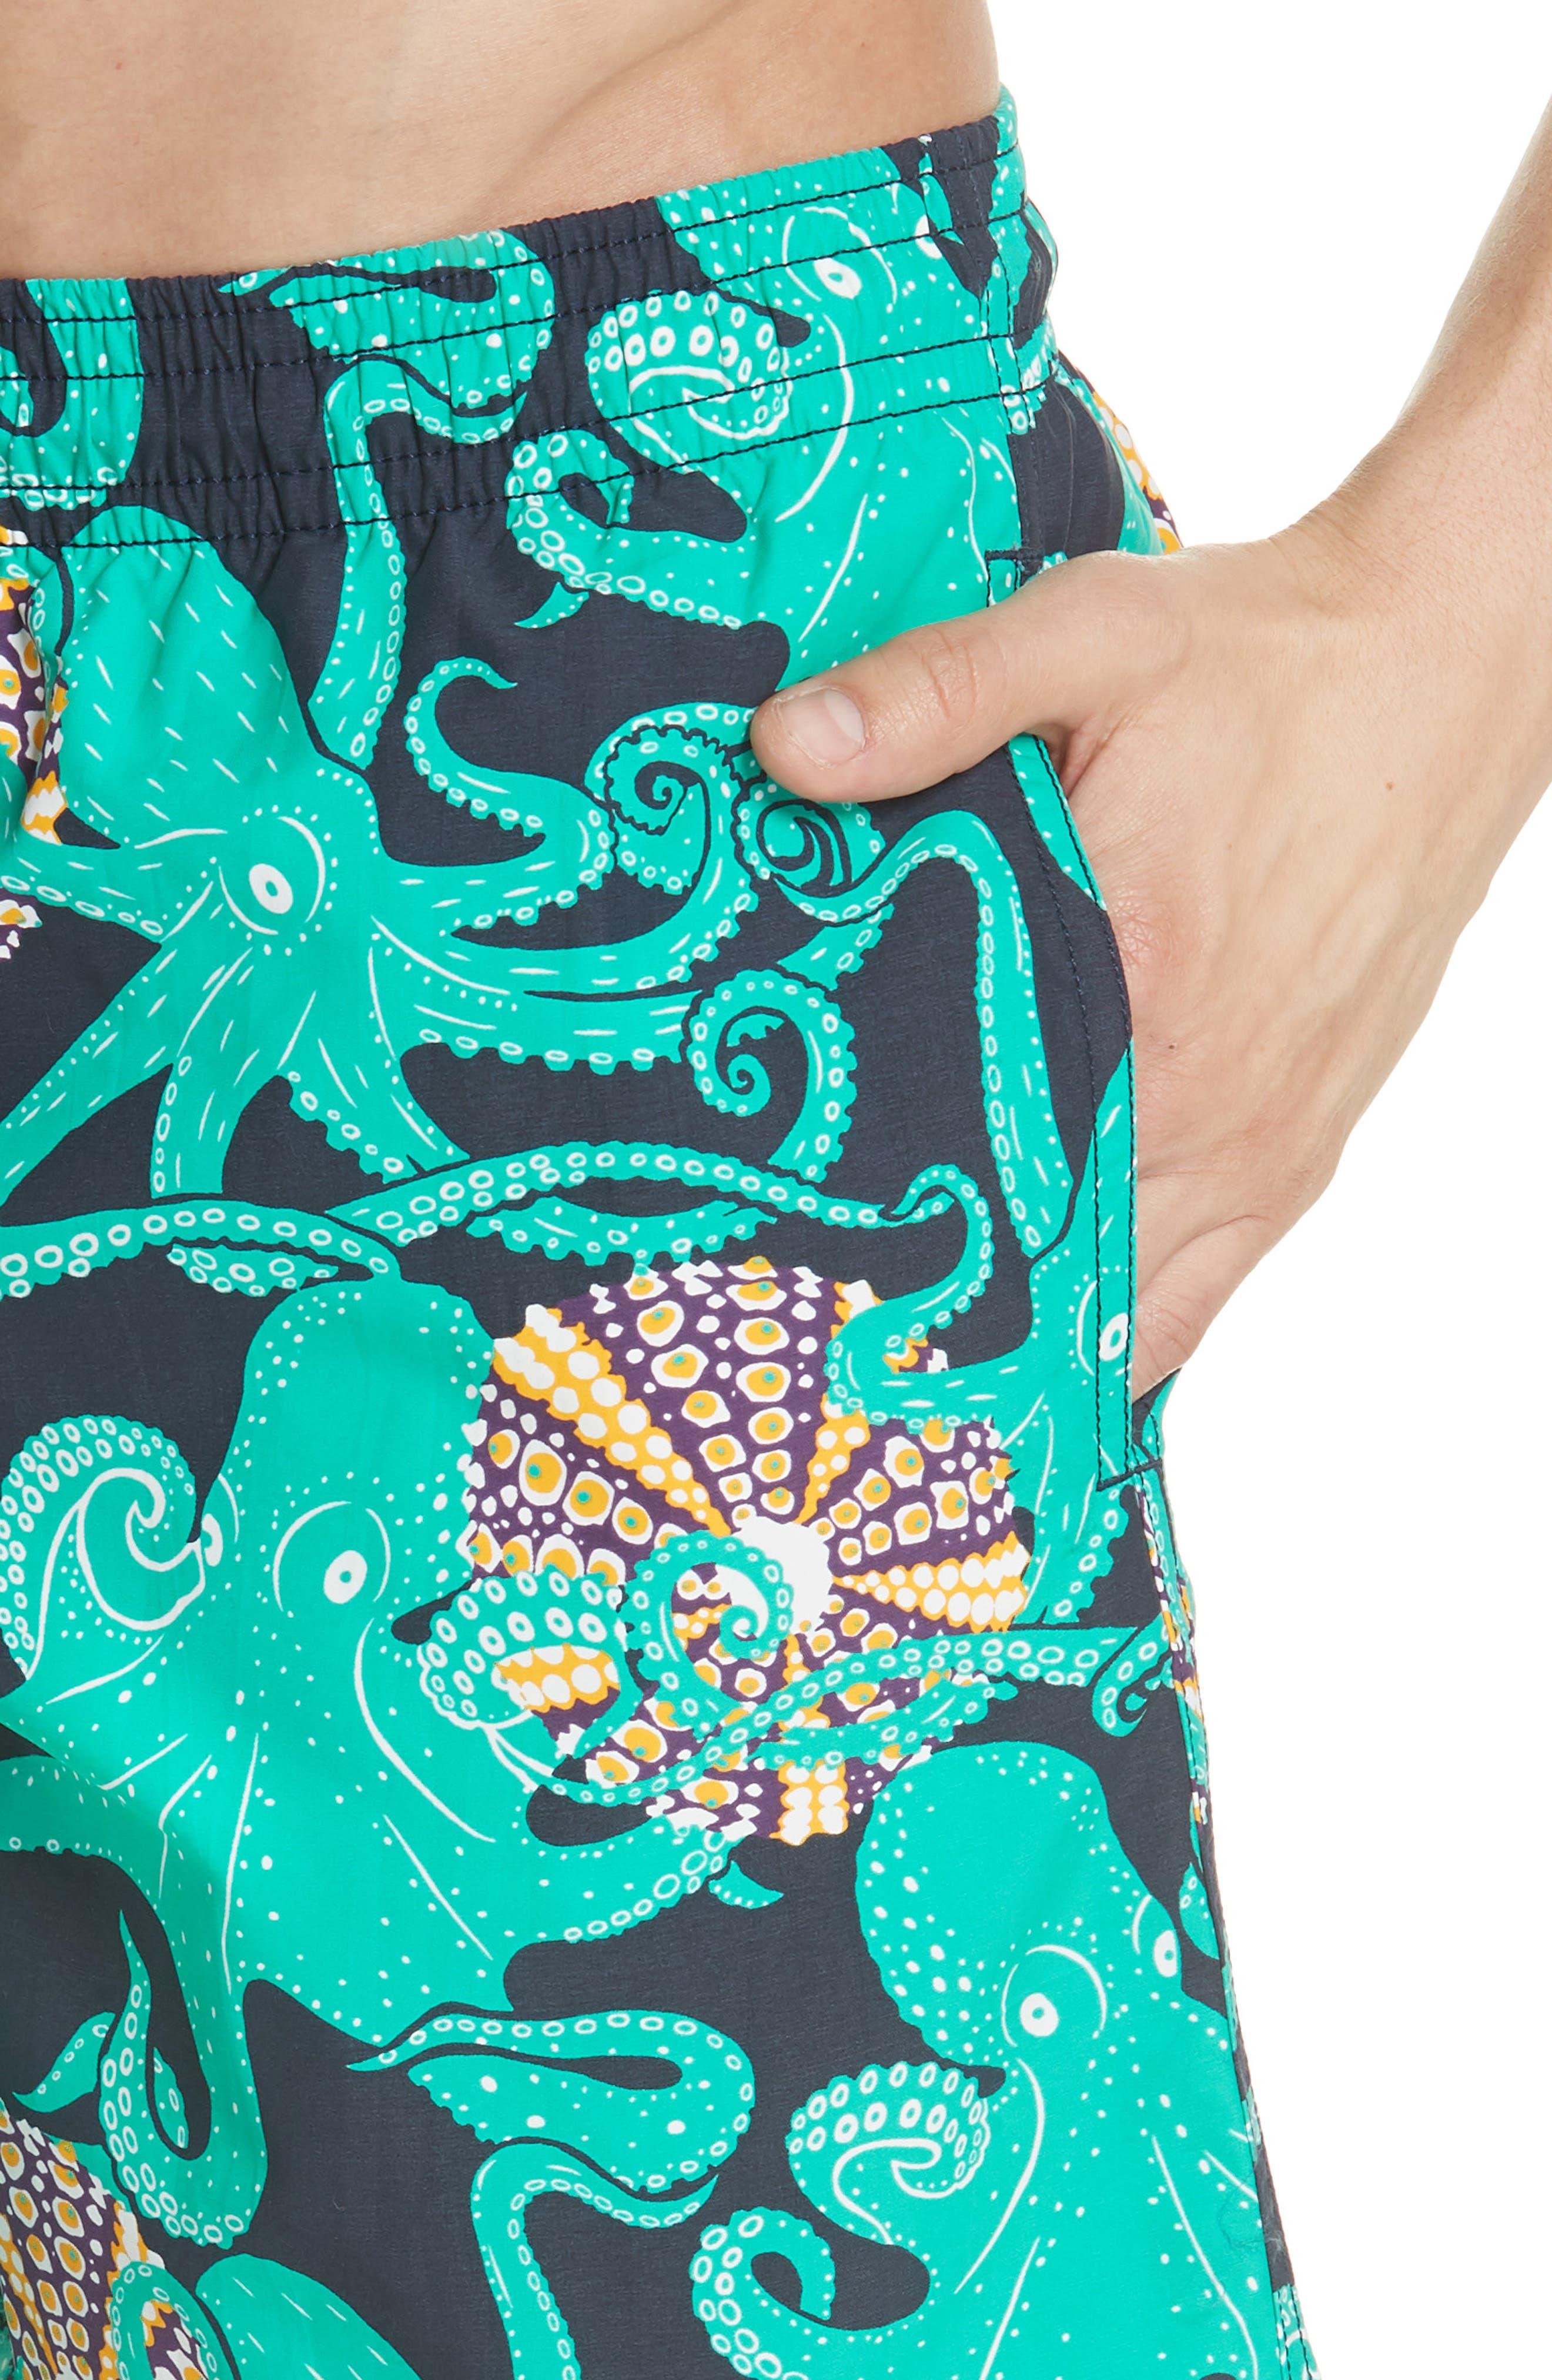 Octopus & Shellfish Print Swim Trunks,                             Alternate thumbnail 4, color,                             NAVY